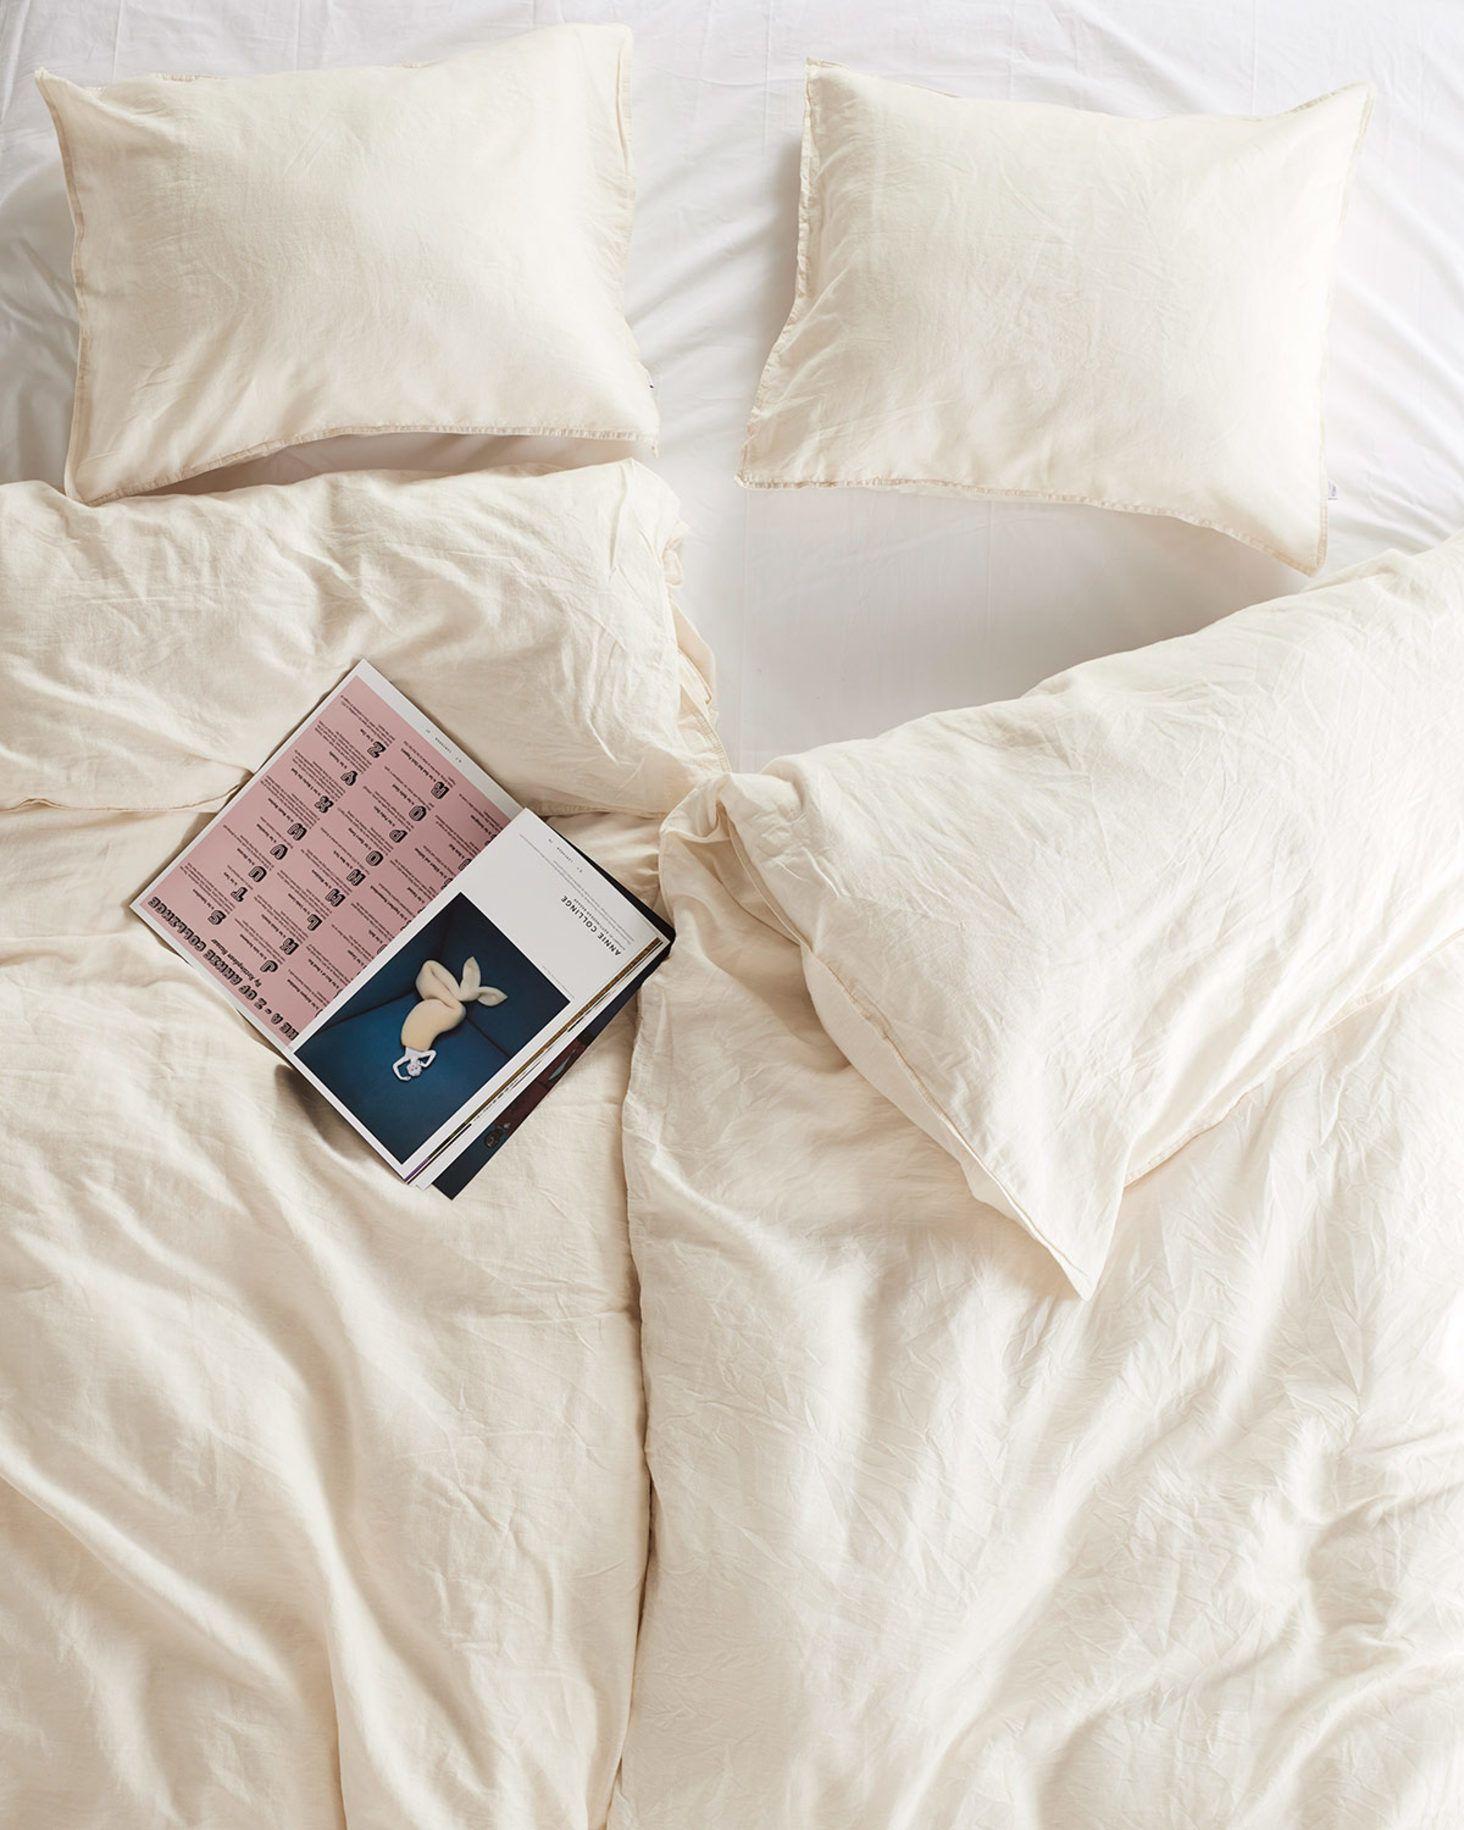 Lovly bedding set made of 50% Ecolabel cotton and 50% linen, perfect for warm and cold nights. #vingahome #vingasweden #vingaofsweden #inredning #interior #skandinaviskahem #scandinavia #homeliving #nordicliving #scandinavianstyle #interiordesign #nordicdesign #nordicdesign #swedenhouse #inredningsinspo #inredningsdetalj